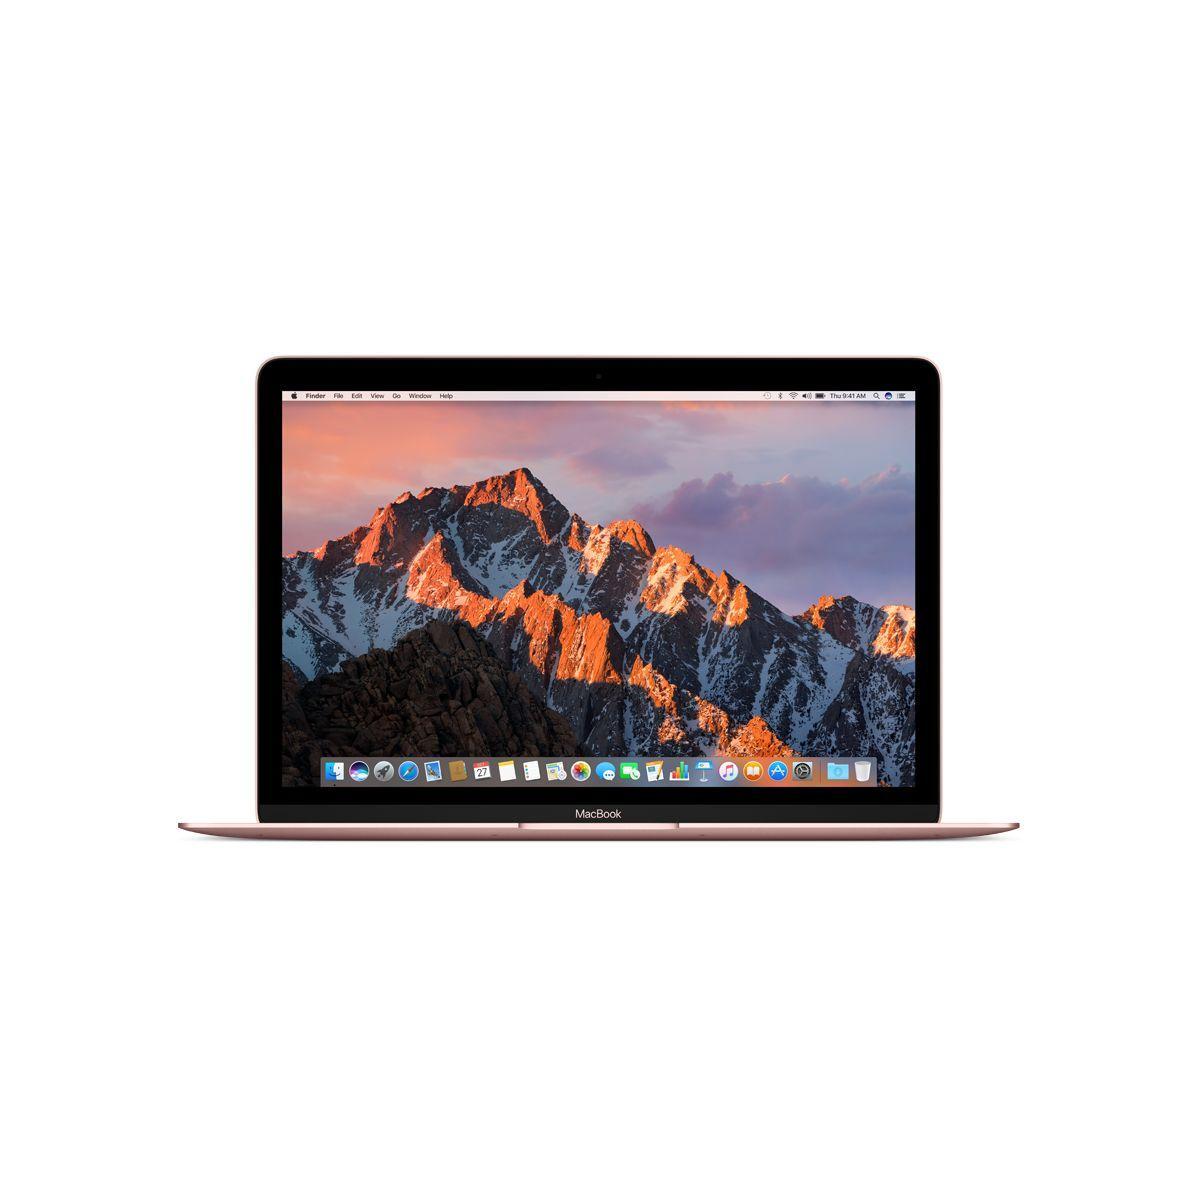 Ordinateur apple macbook 12p 512go or rose i5 1.3ghz (photo)